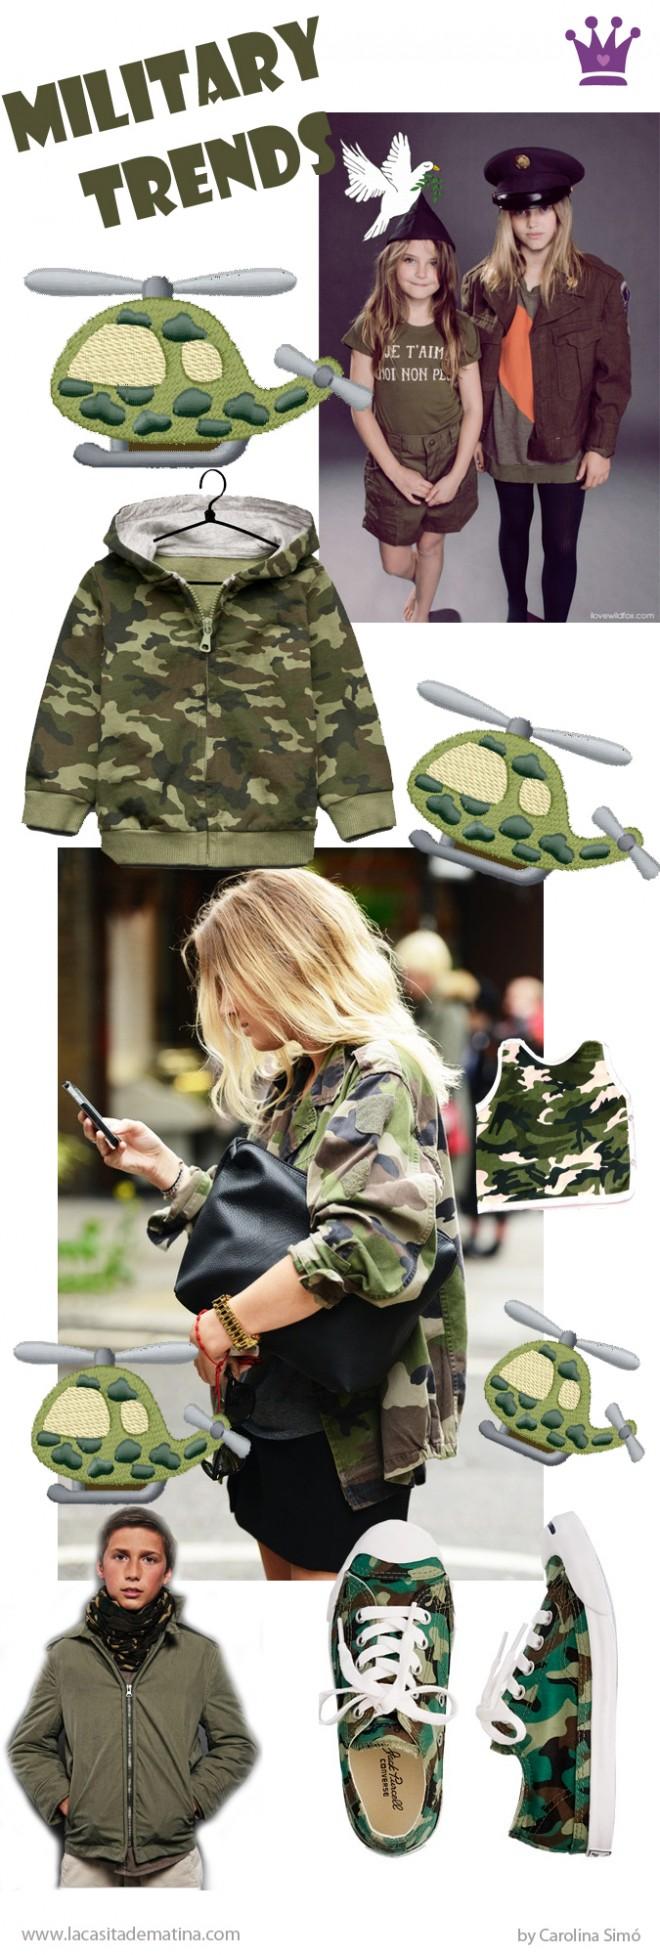 Military trend, Tendencia Militar Moda Infantil, Blog de Moda Infantil, La casita de Martina, Kids trends